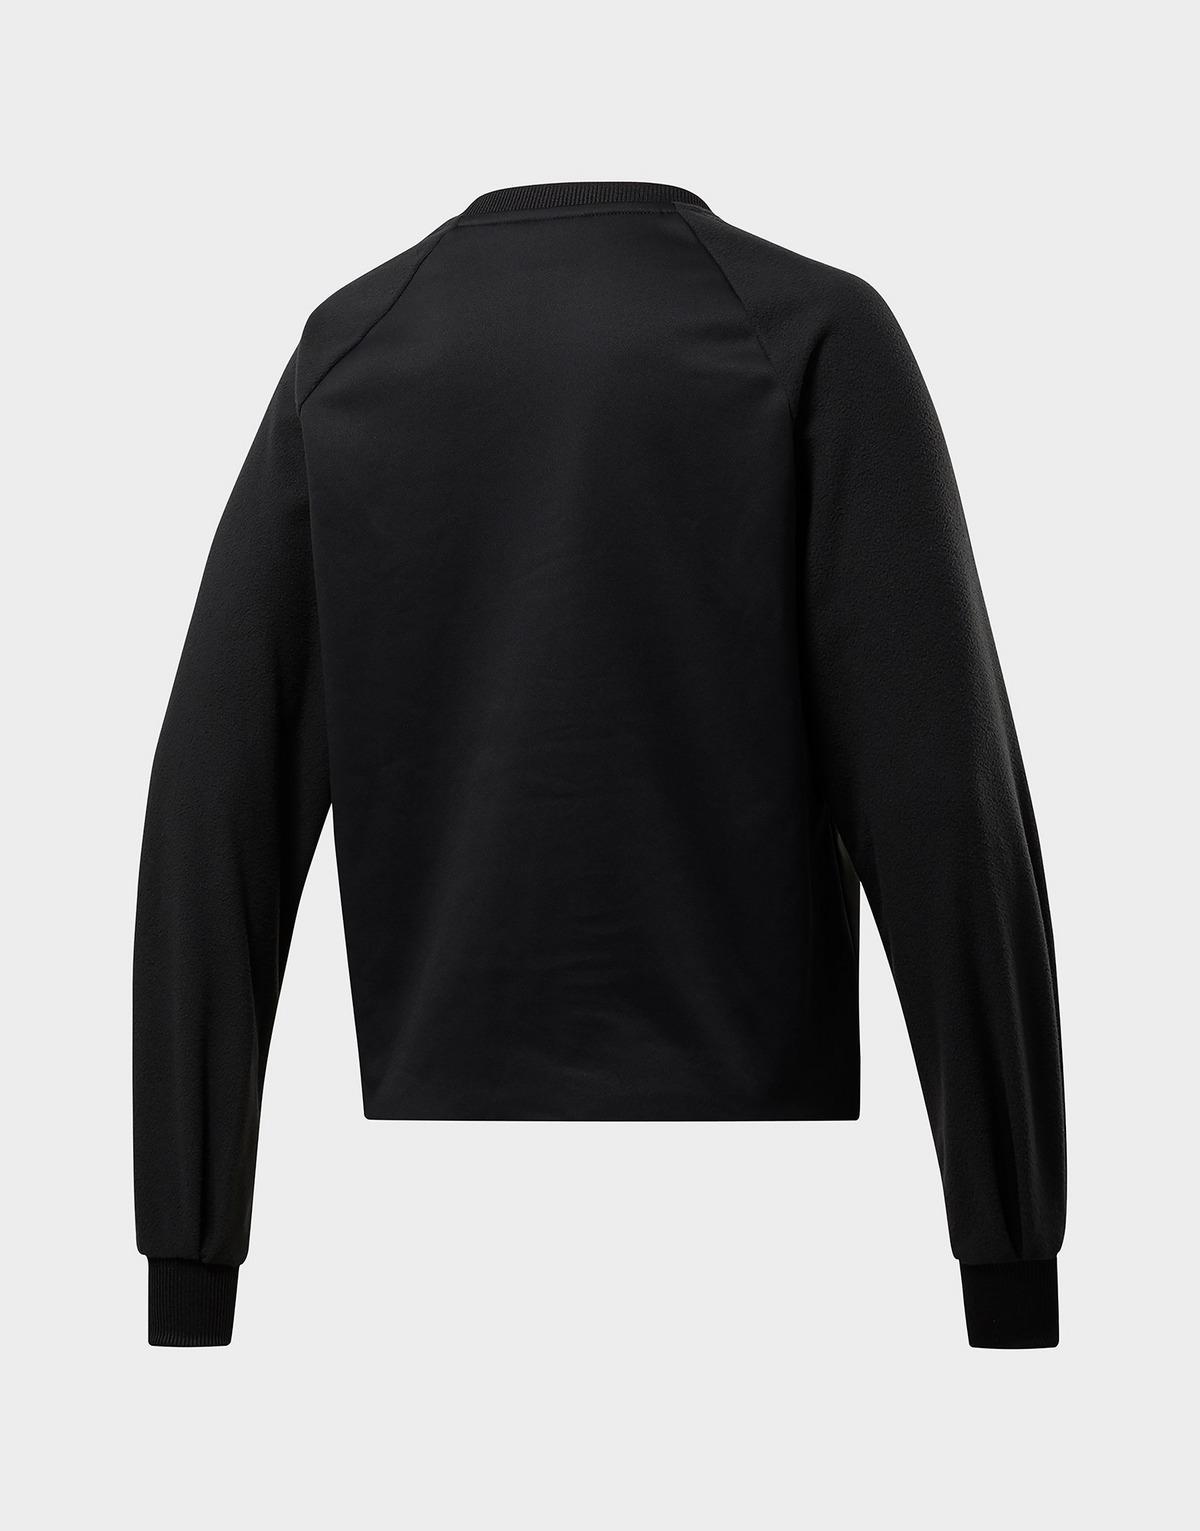 Reebok Classics Crew Sweatshirt